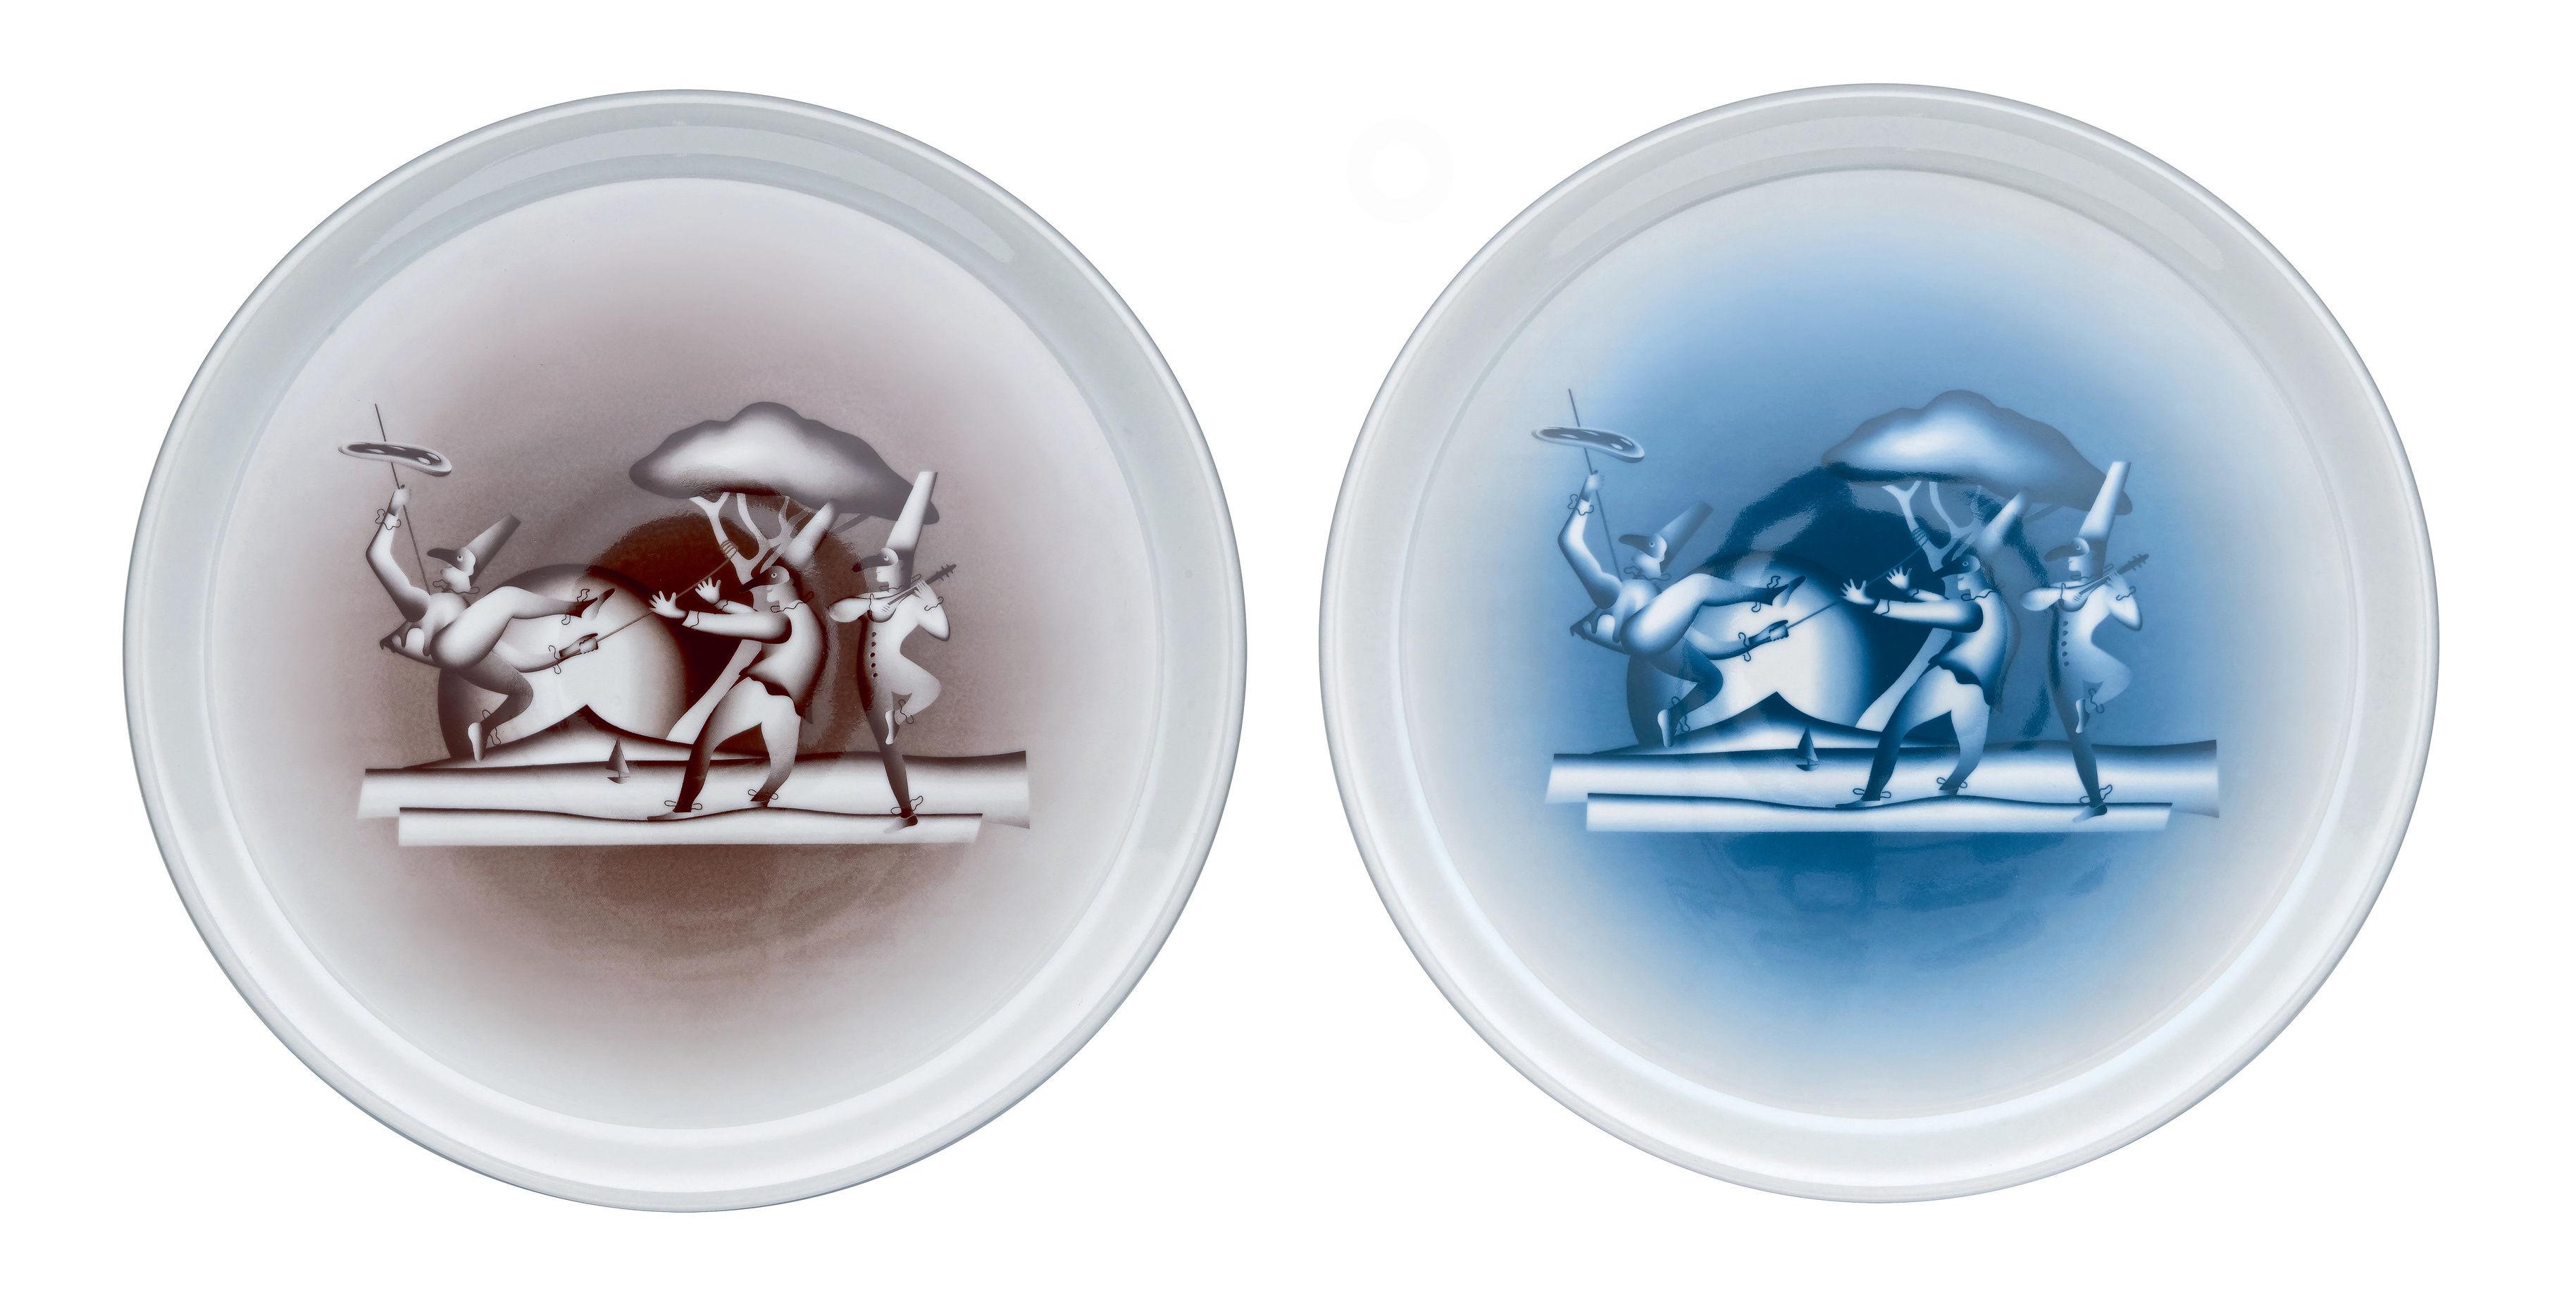 Tischkultur - Teller - #VivaNapoli Pizzatelller / 2er-Set - A di Alessi - Braun & blau - Porzellan